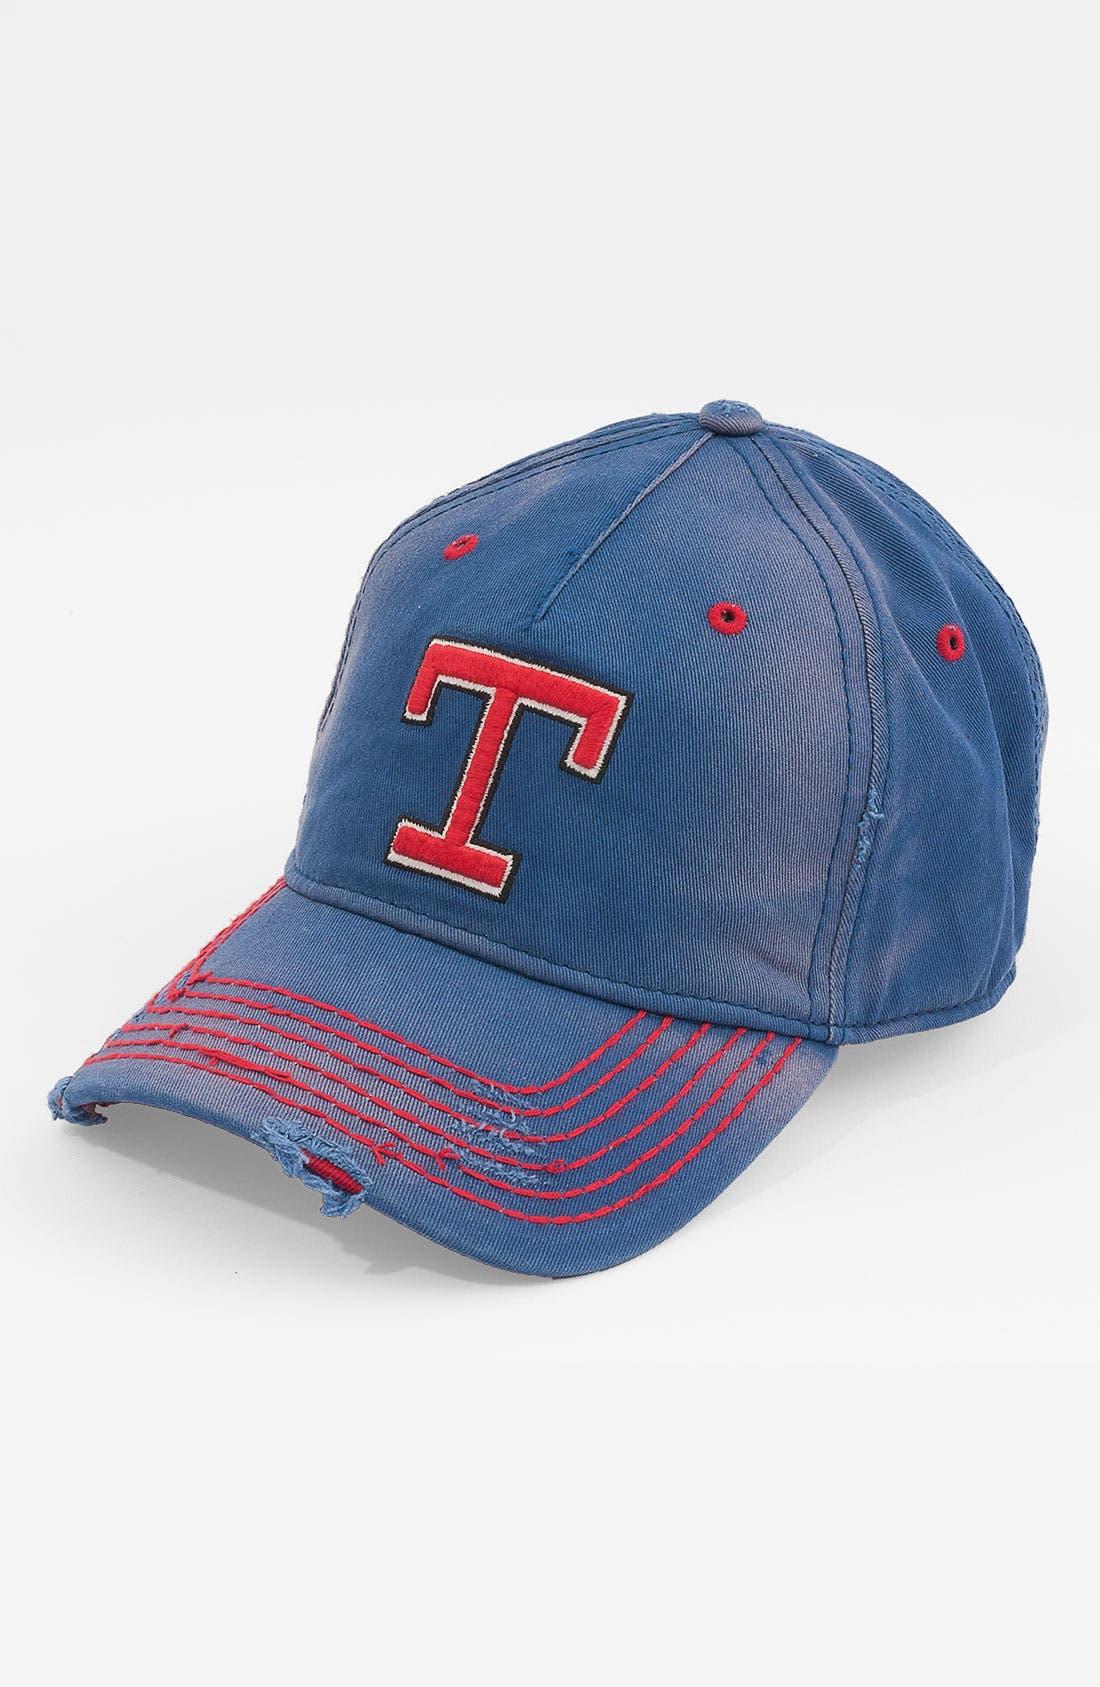 Alternate Image 1 Selected - American Needle 'Texas Rangers' Baseball Cap